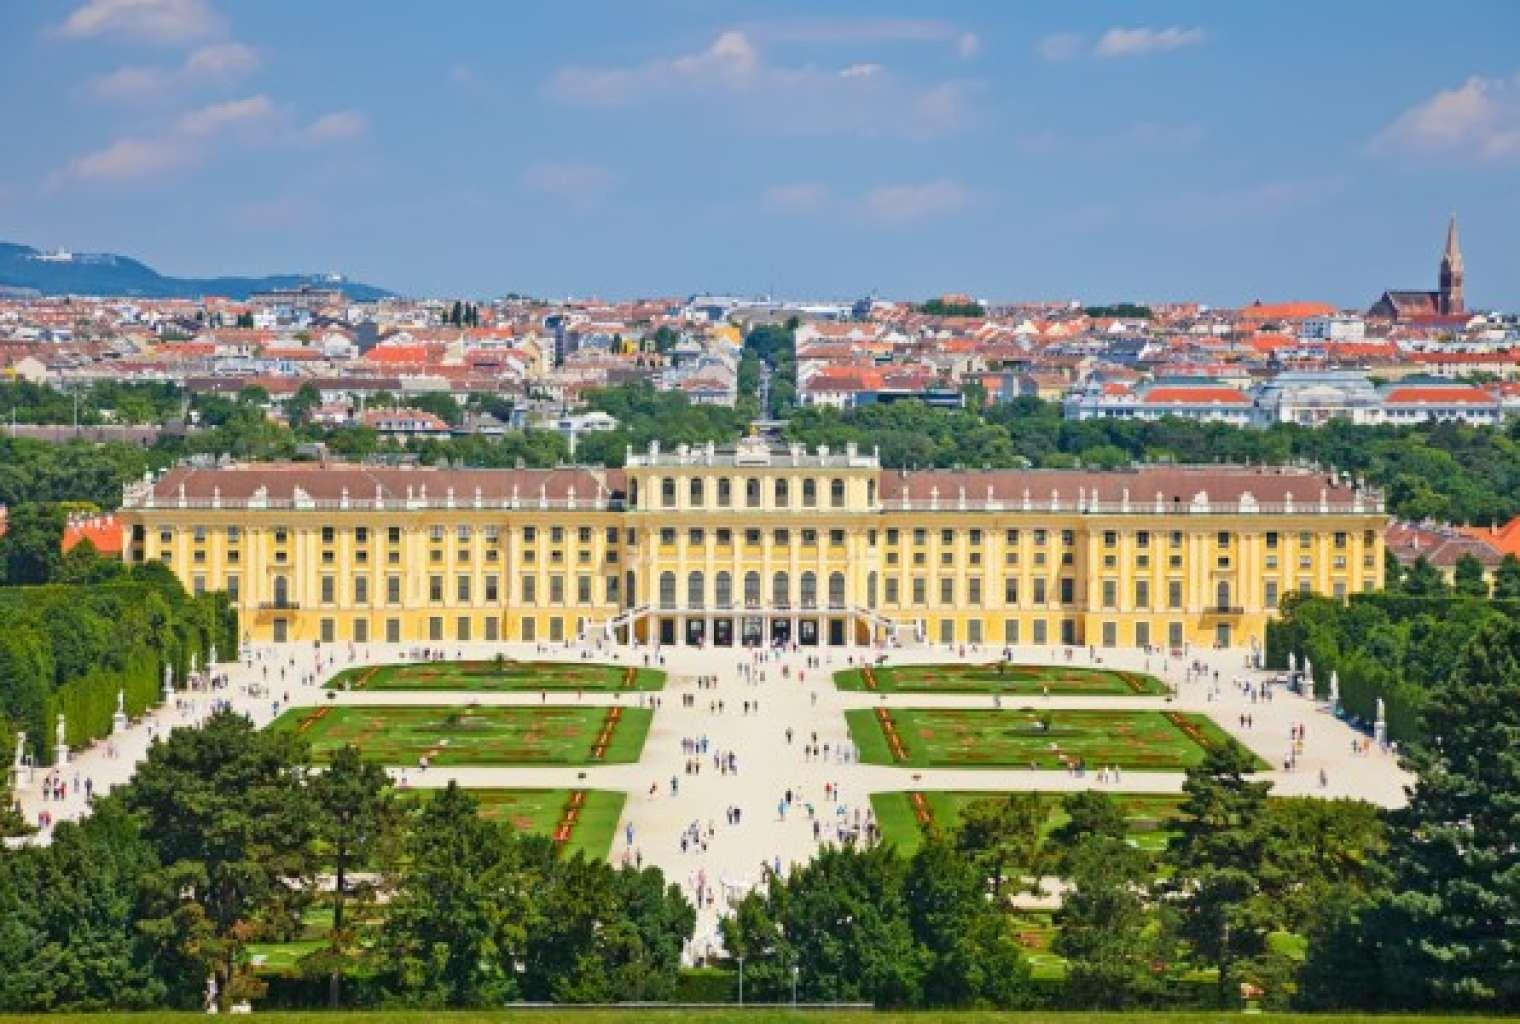 Het prachtige Schloss Schönbrunn (Foto: Marianne Visser van Klaarwater) Vakantieboulevard.nl, verrassend andere reizen